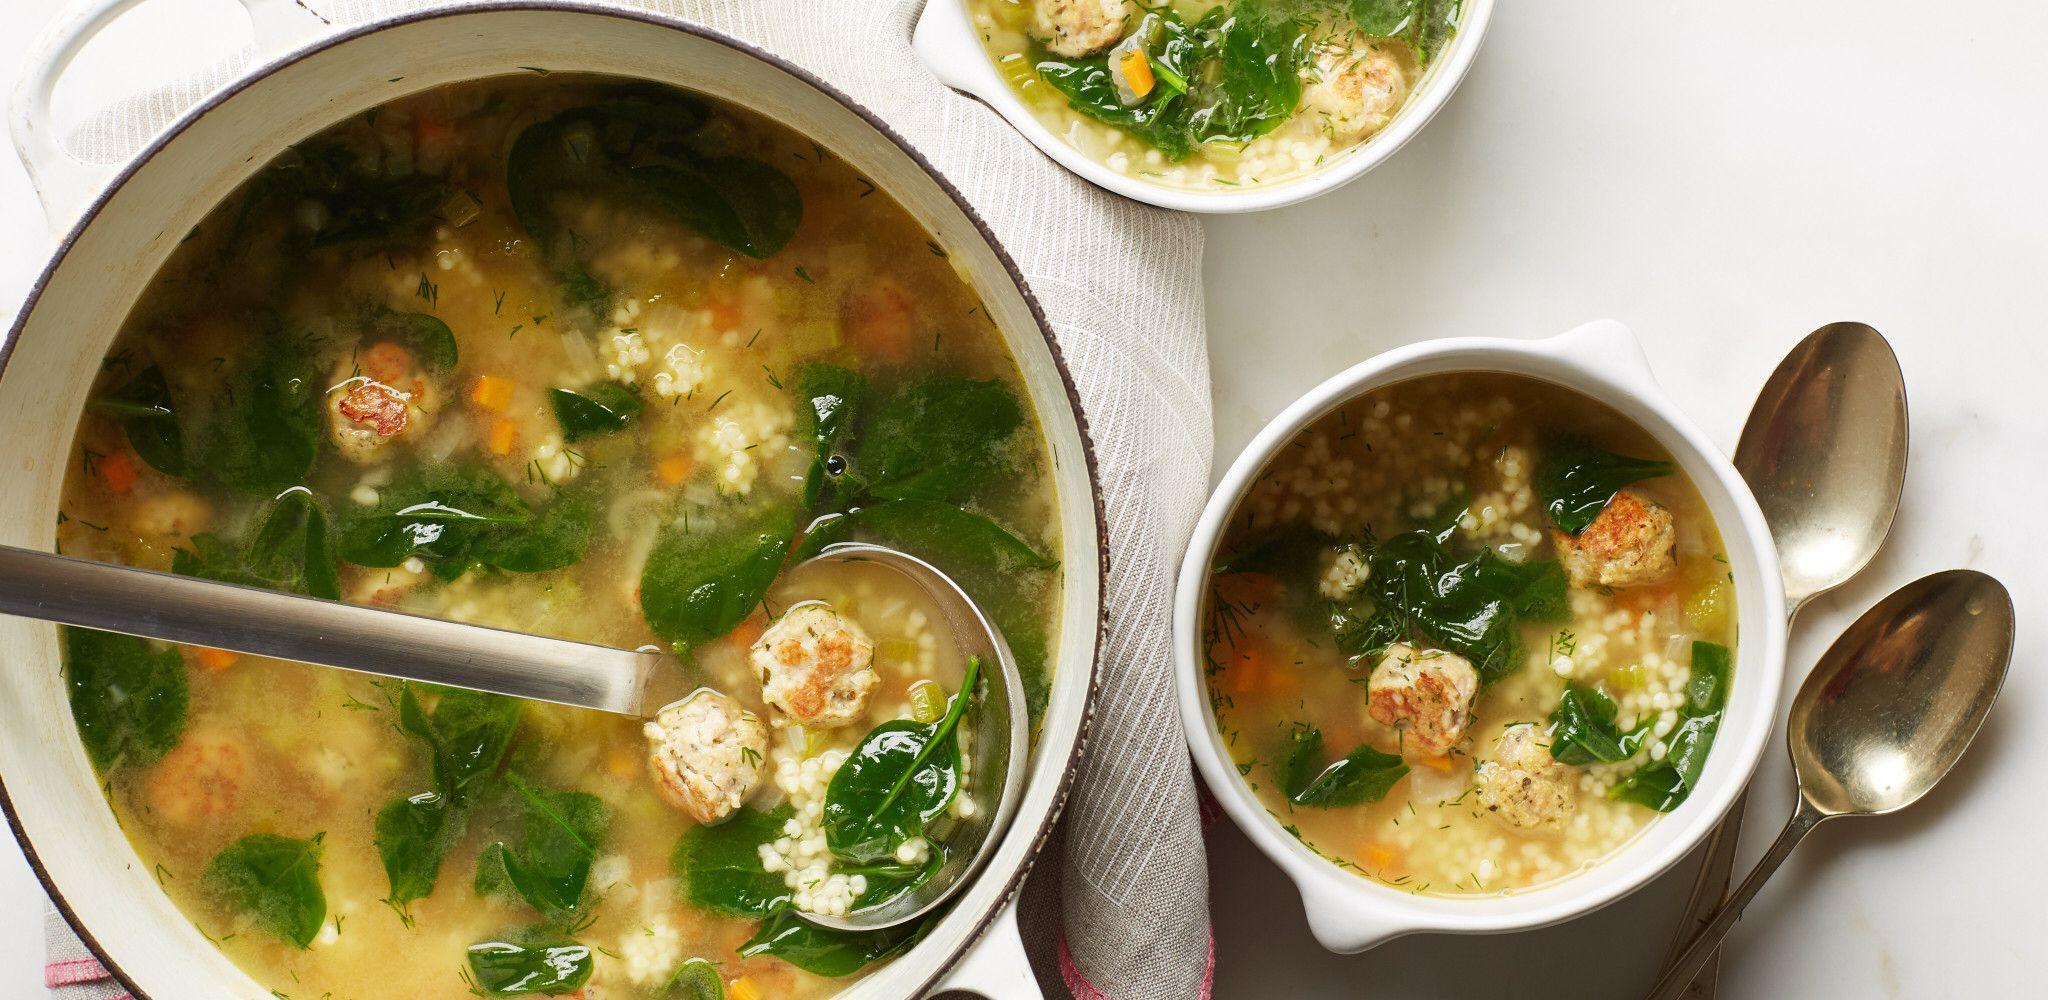 Italian Wedding Soup Recipe in 2020 Wedding soup, Food